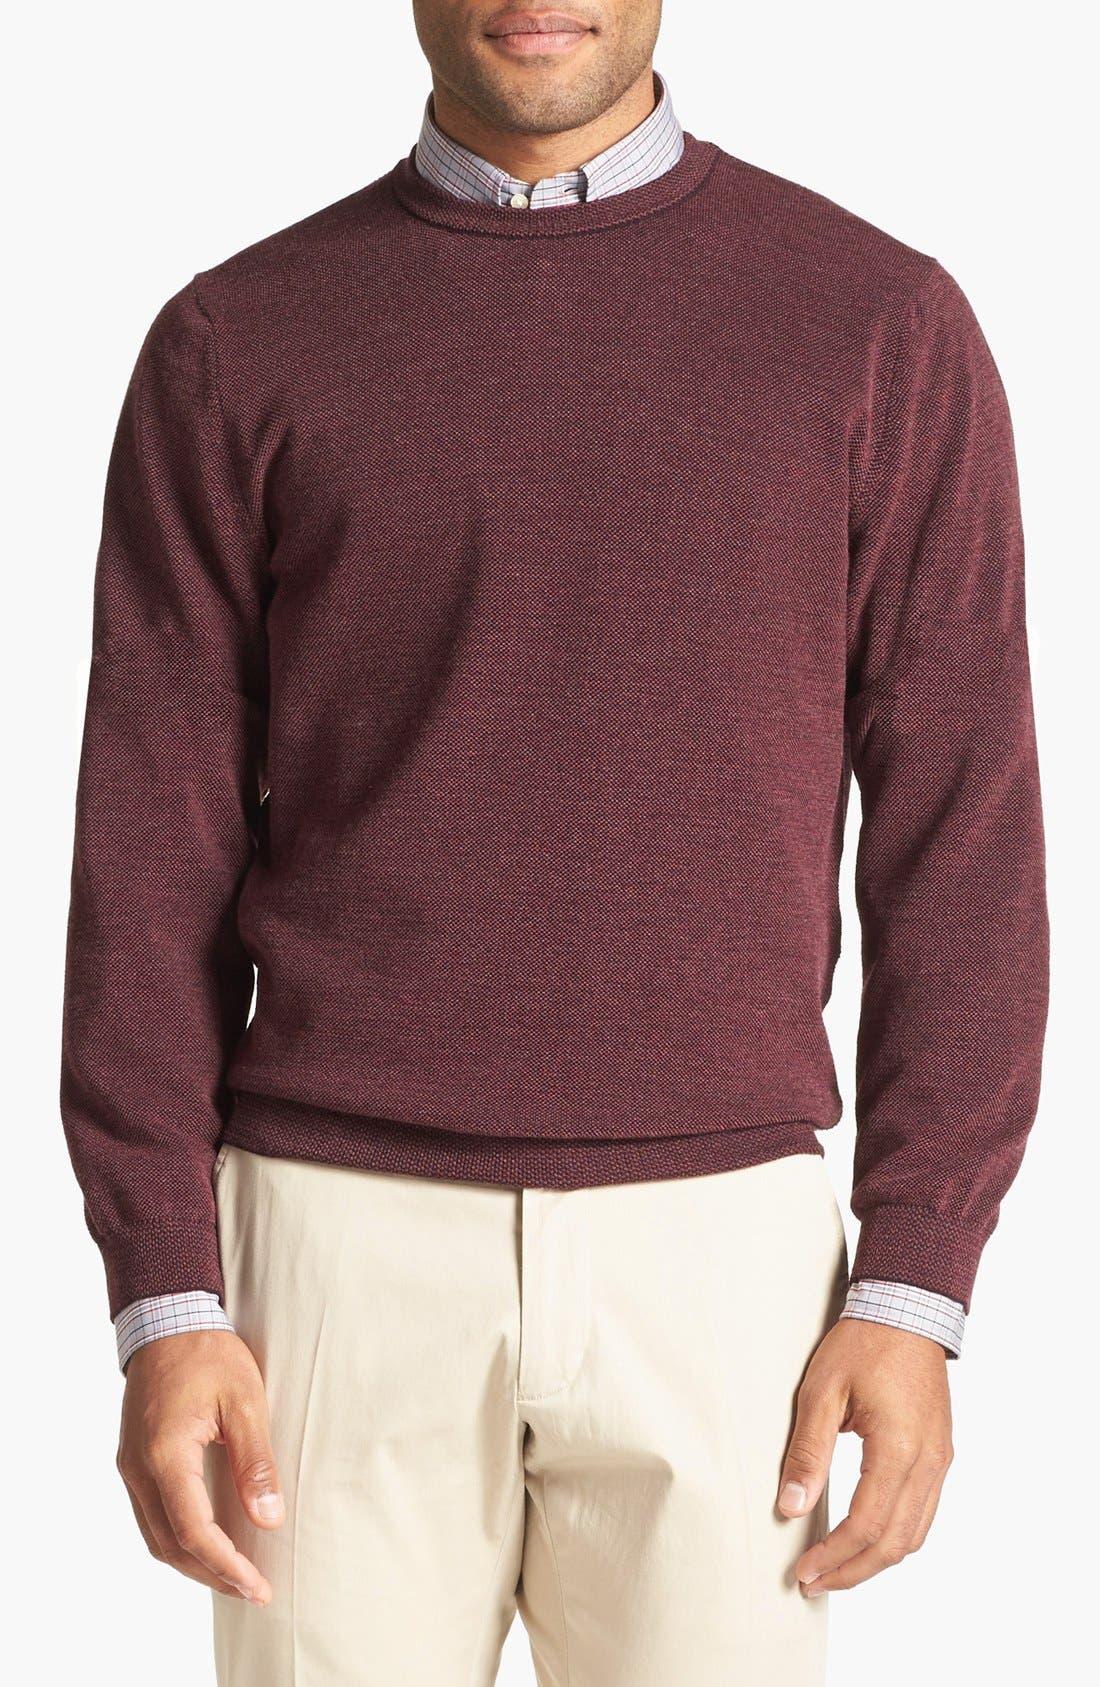 Main Image - John W. Nordstrom® Merino Wool Crewneck Sweater